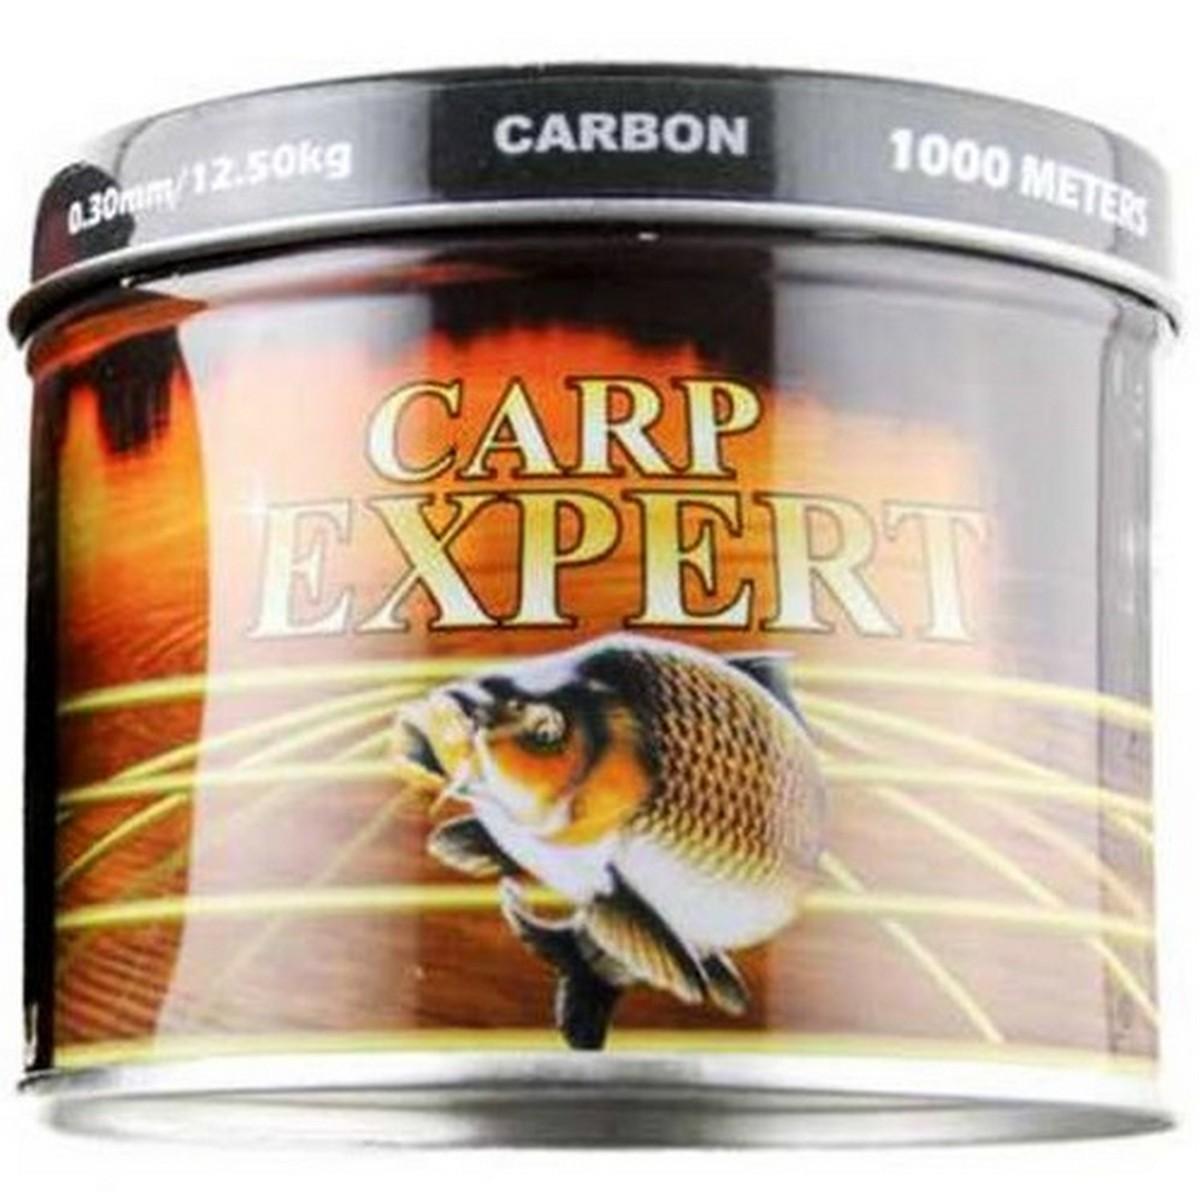 Риболовно влакно Carp Expert Carbon 1000m